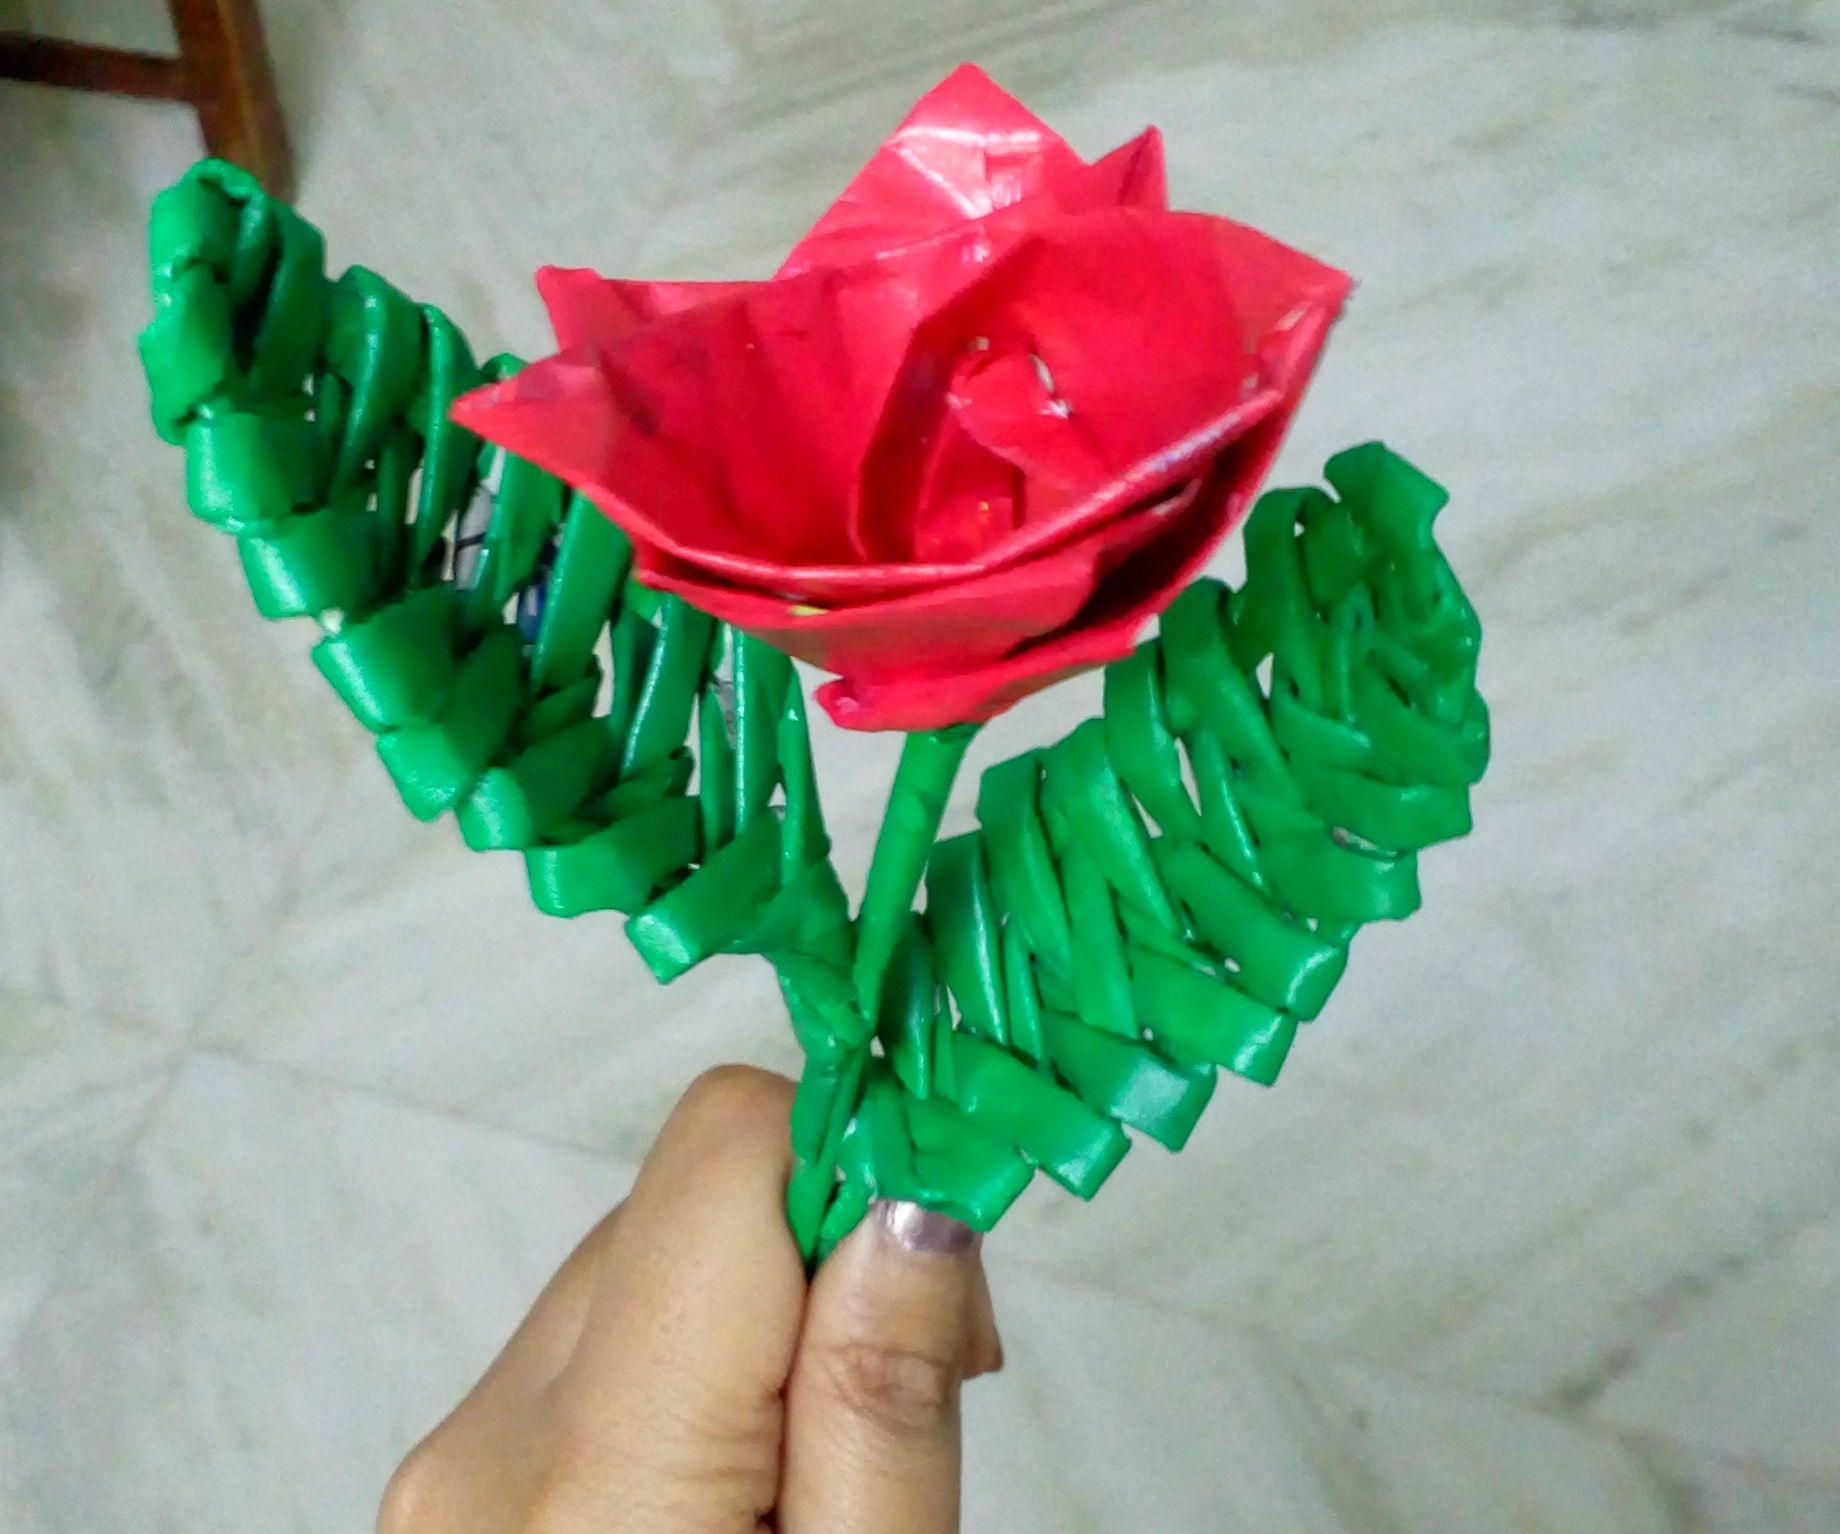 Newspaper Tubes Weaving Leaf | How to Weave a Leaf Using Newspaper Tube | DIY CraftsLane